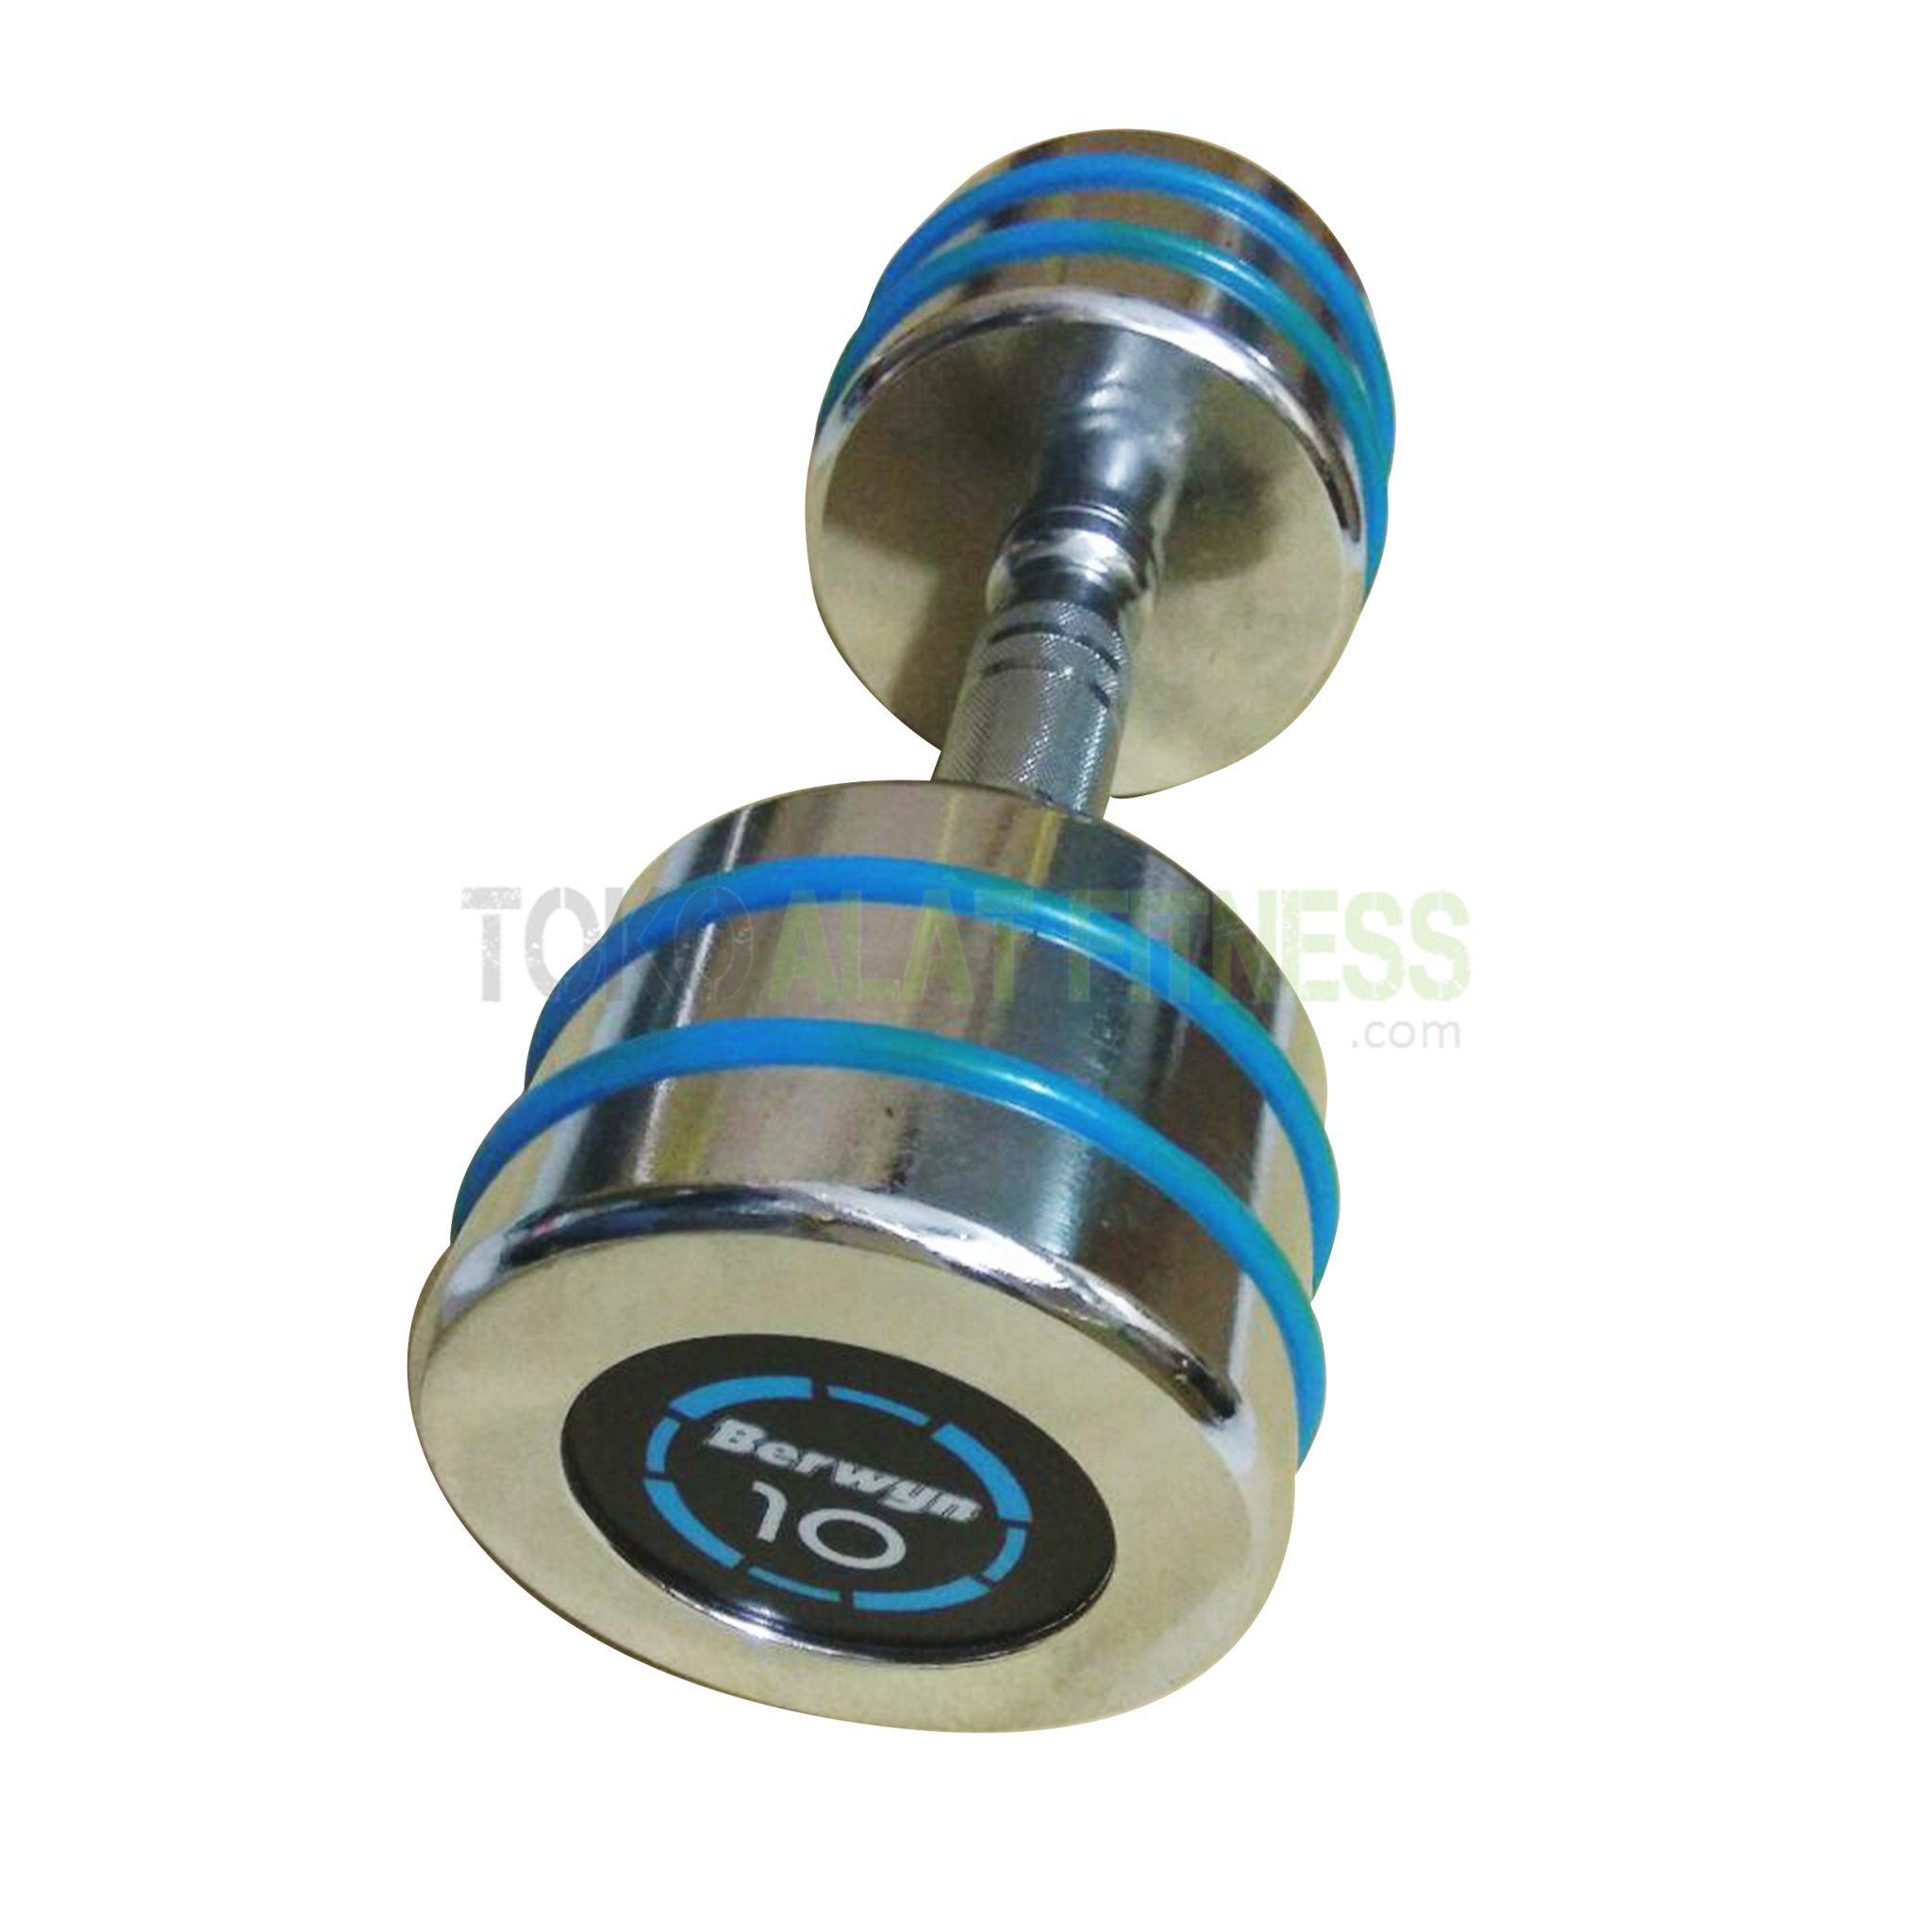 berwyn dumbell 10kg wtm - Dumbell Chrome 10kg Berwyn - ASSD48